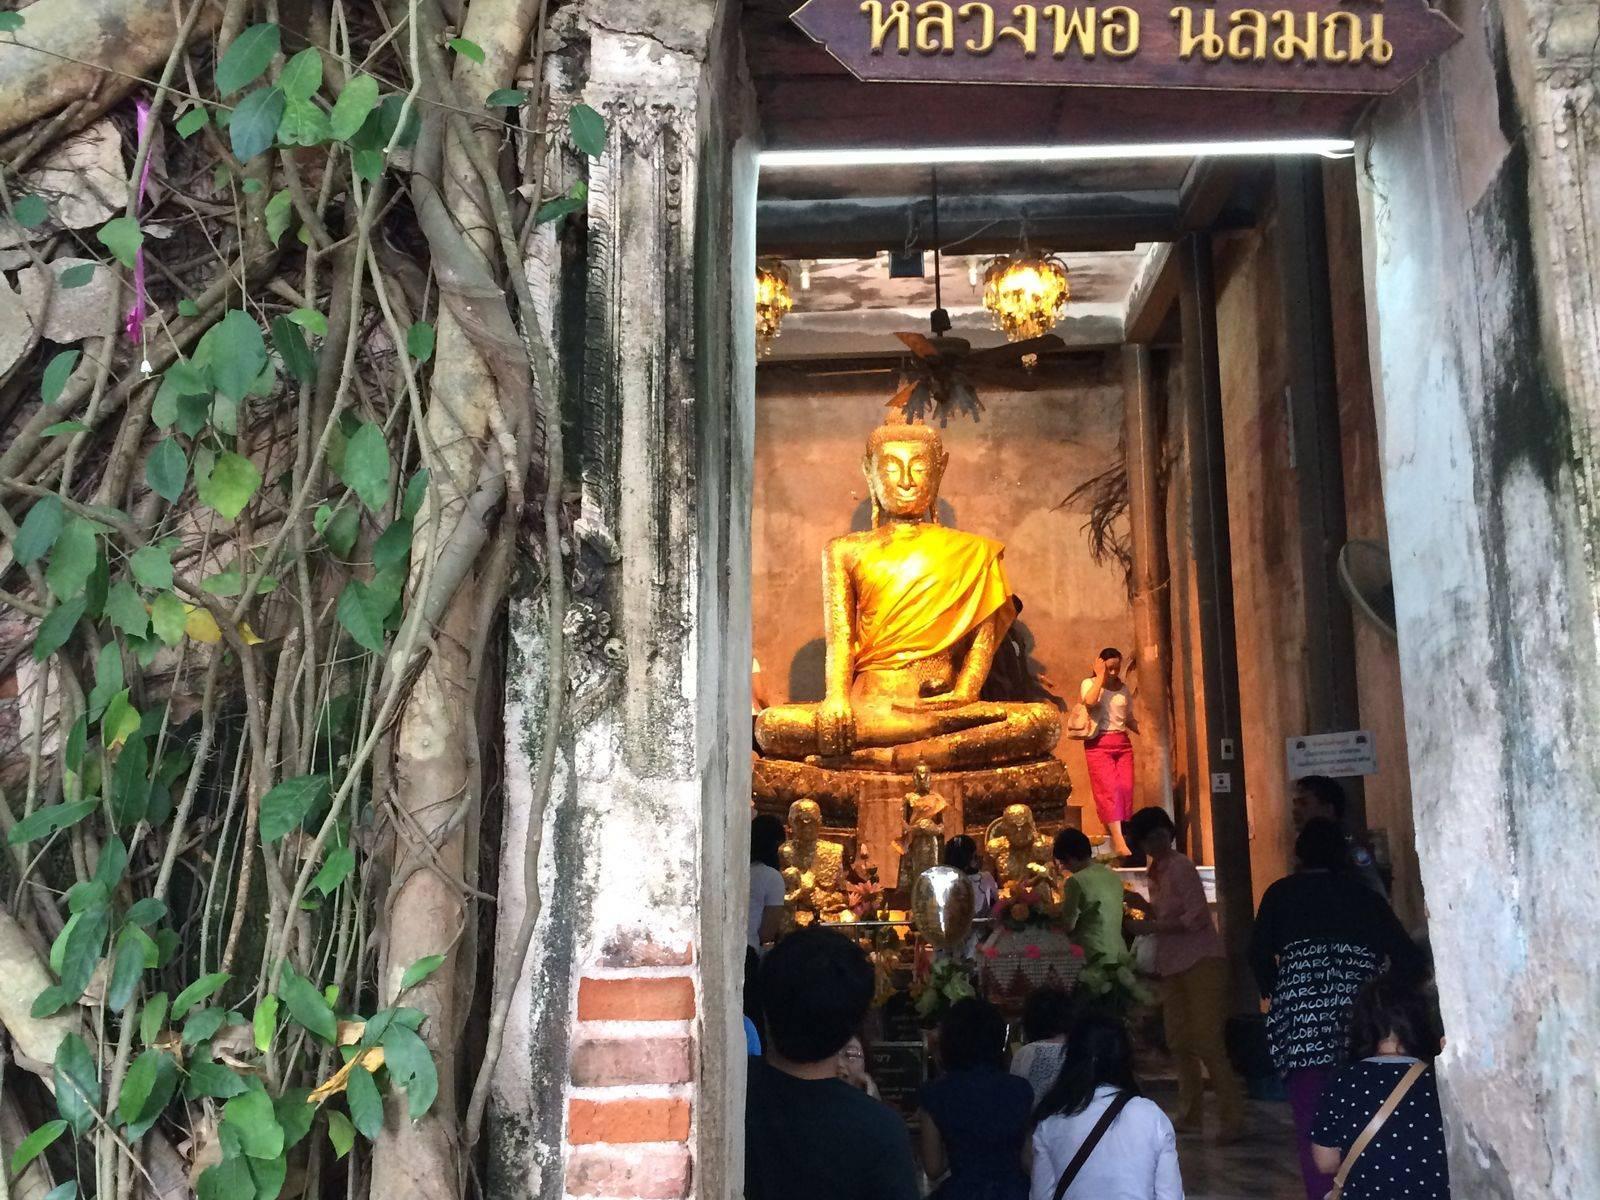 [Private Boat] Mae Klong Railway Market x Damnoen Saduak Floating Market x Bang Kung Temple (Buddha statue in Tree-covered Temple)